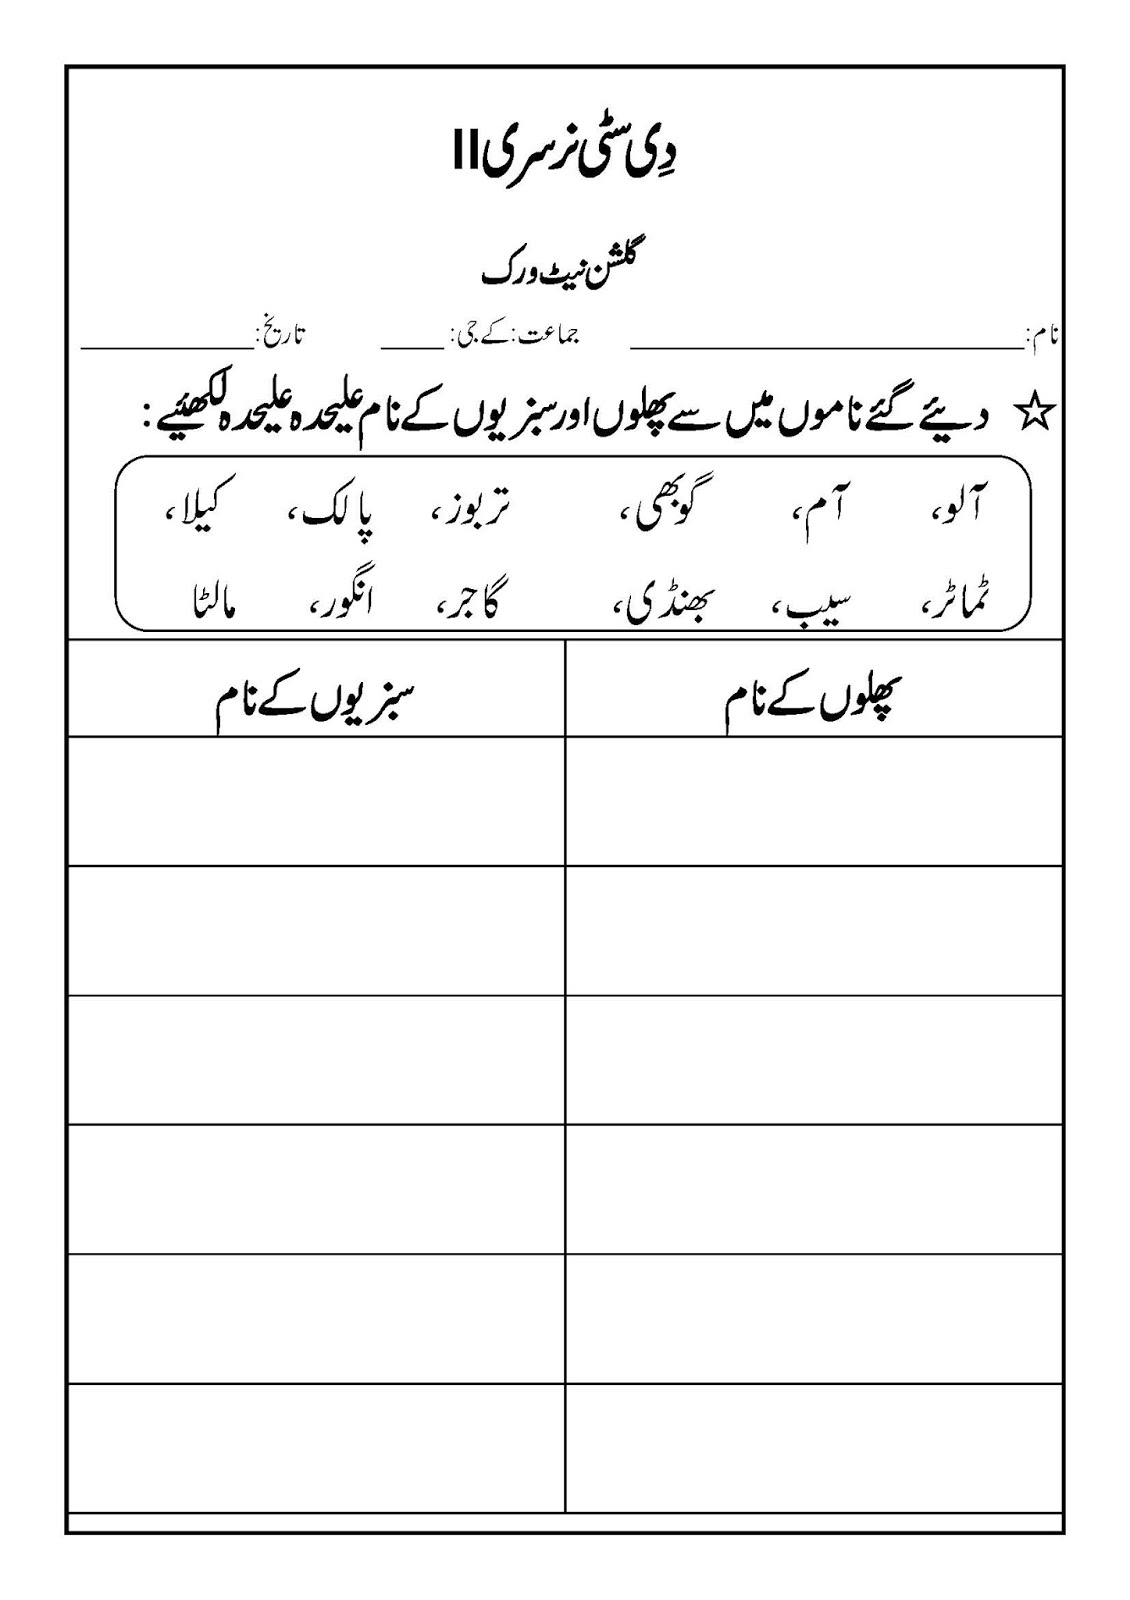 hight resolution of Kalama In Urdu Of Worksheet   Printable Worksheets and Activities for  Teachers